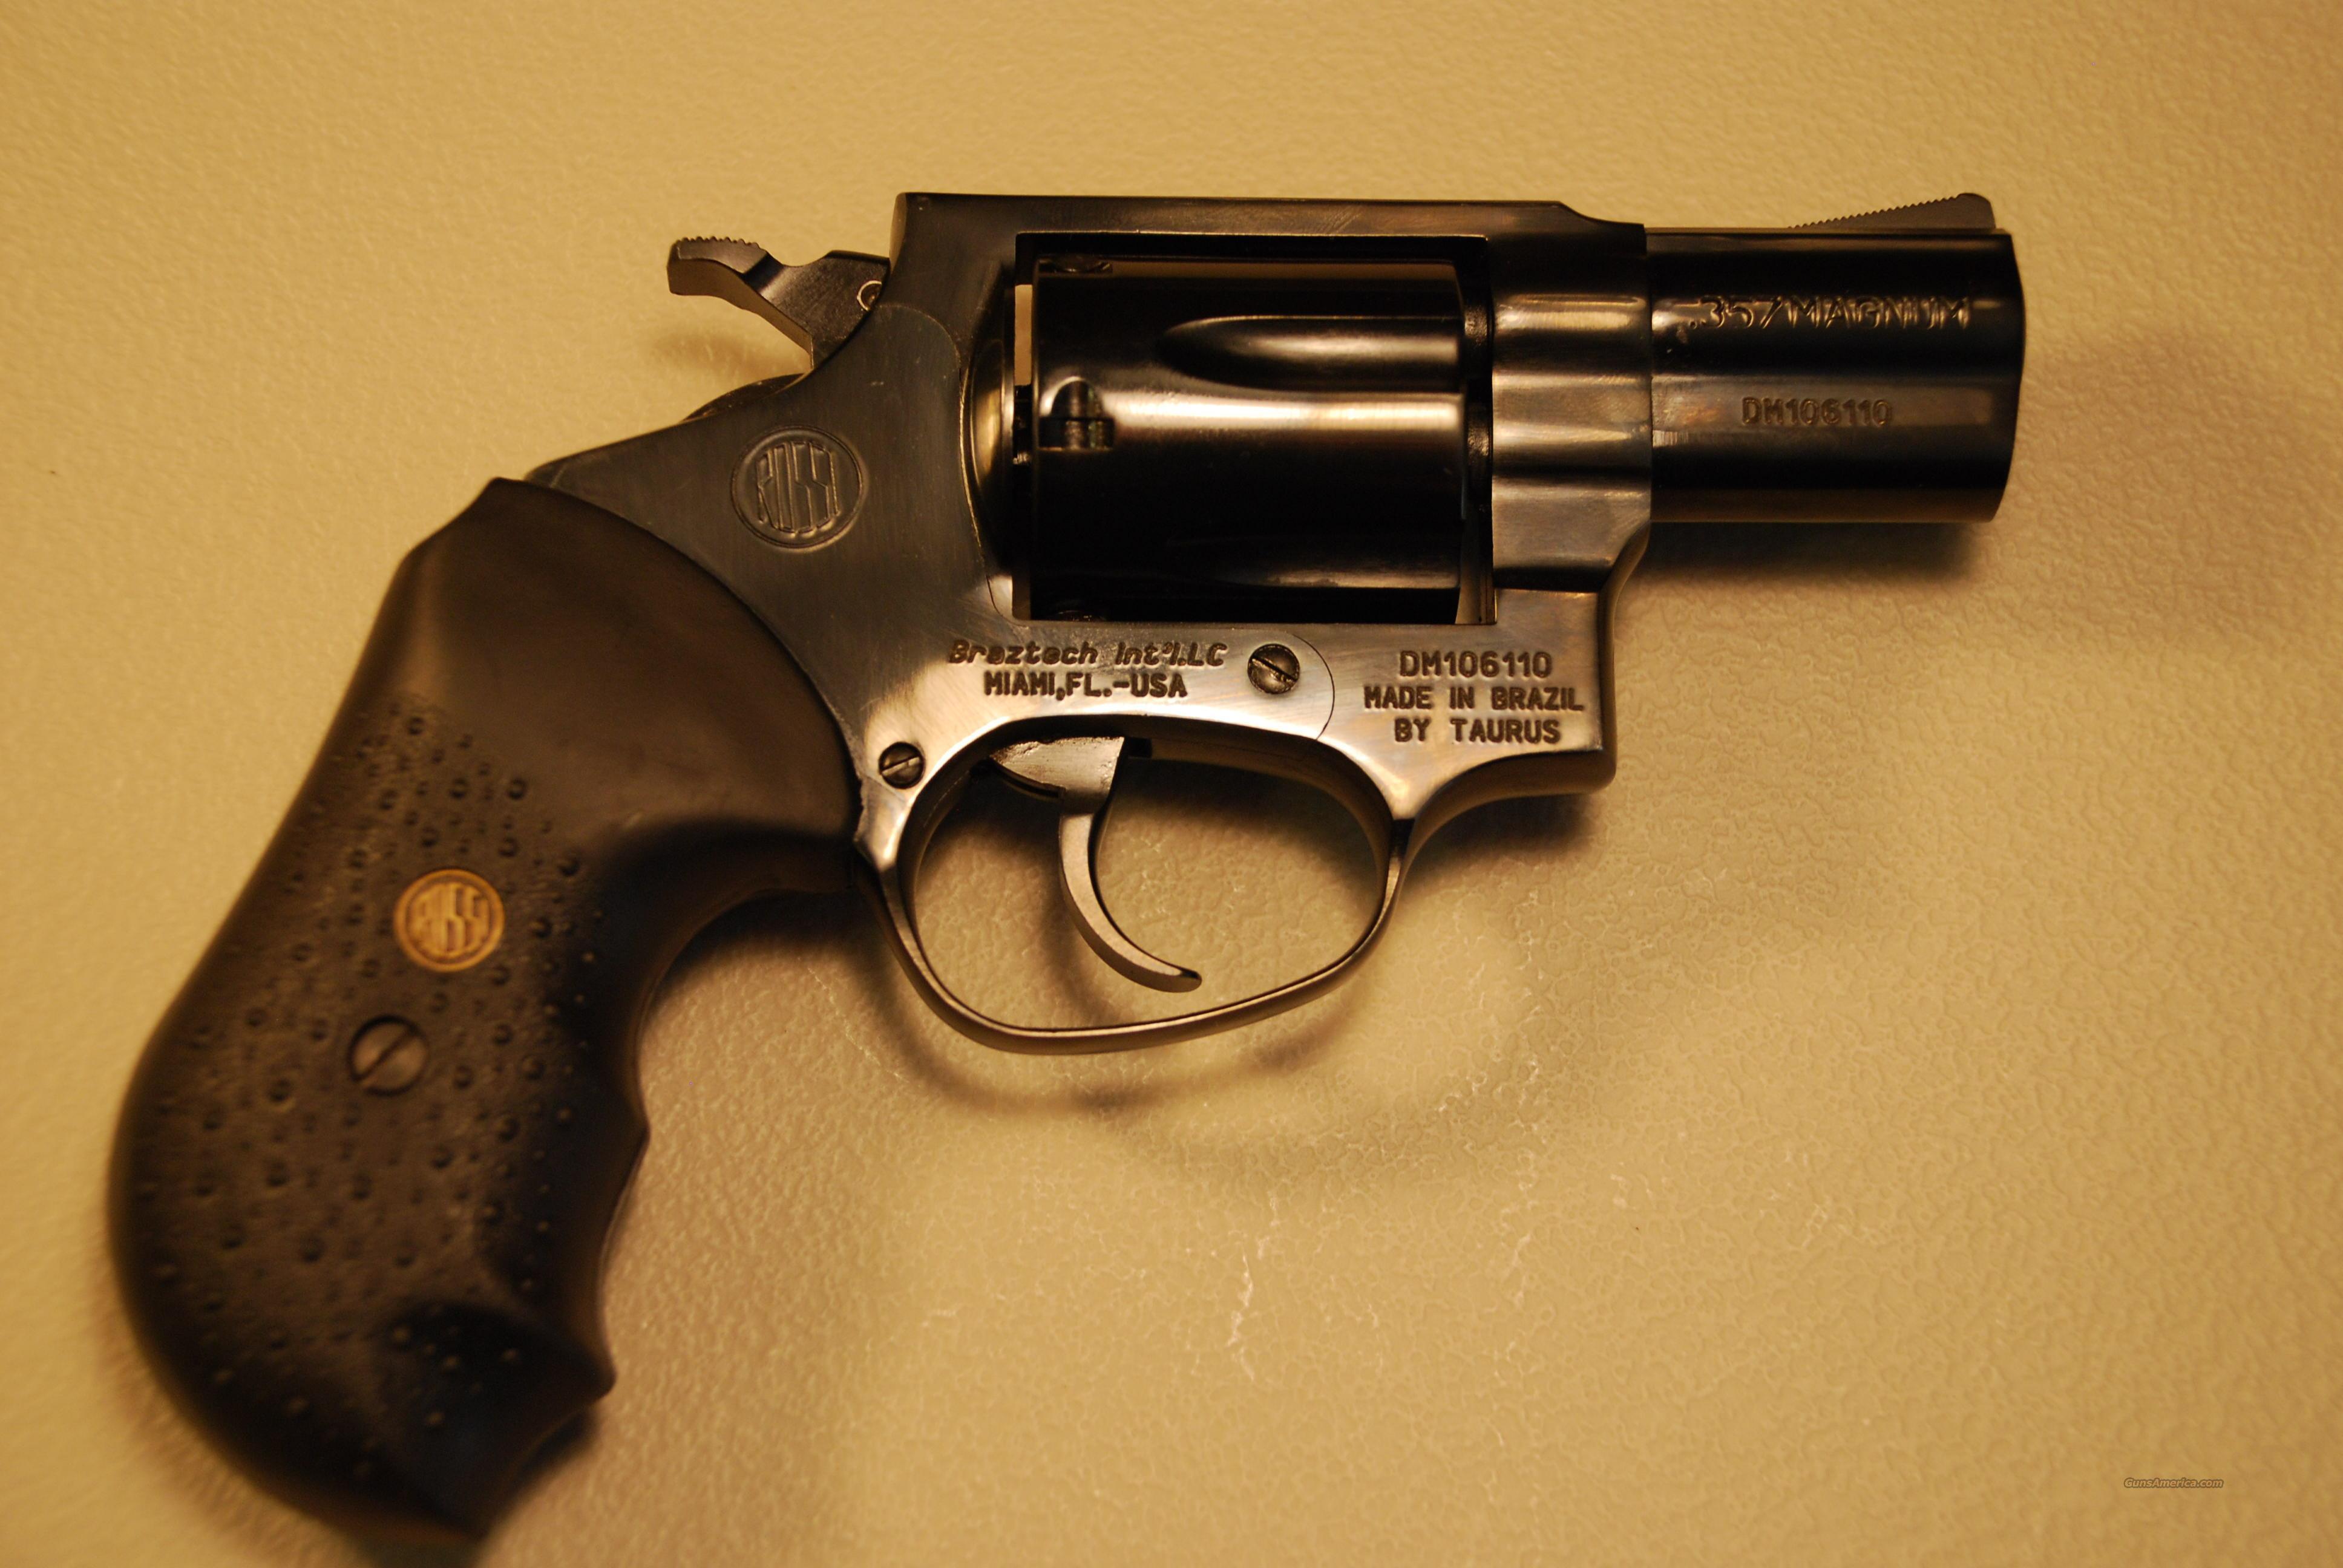 Rossi .357 Magnum Snub-nosed Revolver - New in box Guns > Pistols >&#8221;/></a></p> <h2>Patricia Rossi II</h2> <p><iframe height=481 width=608 src=